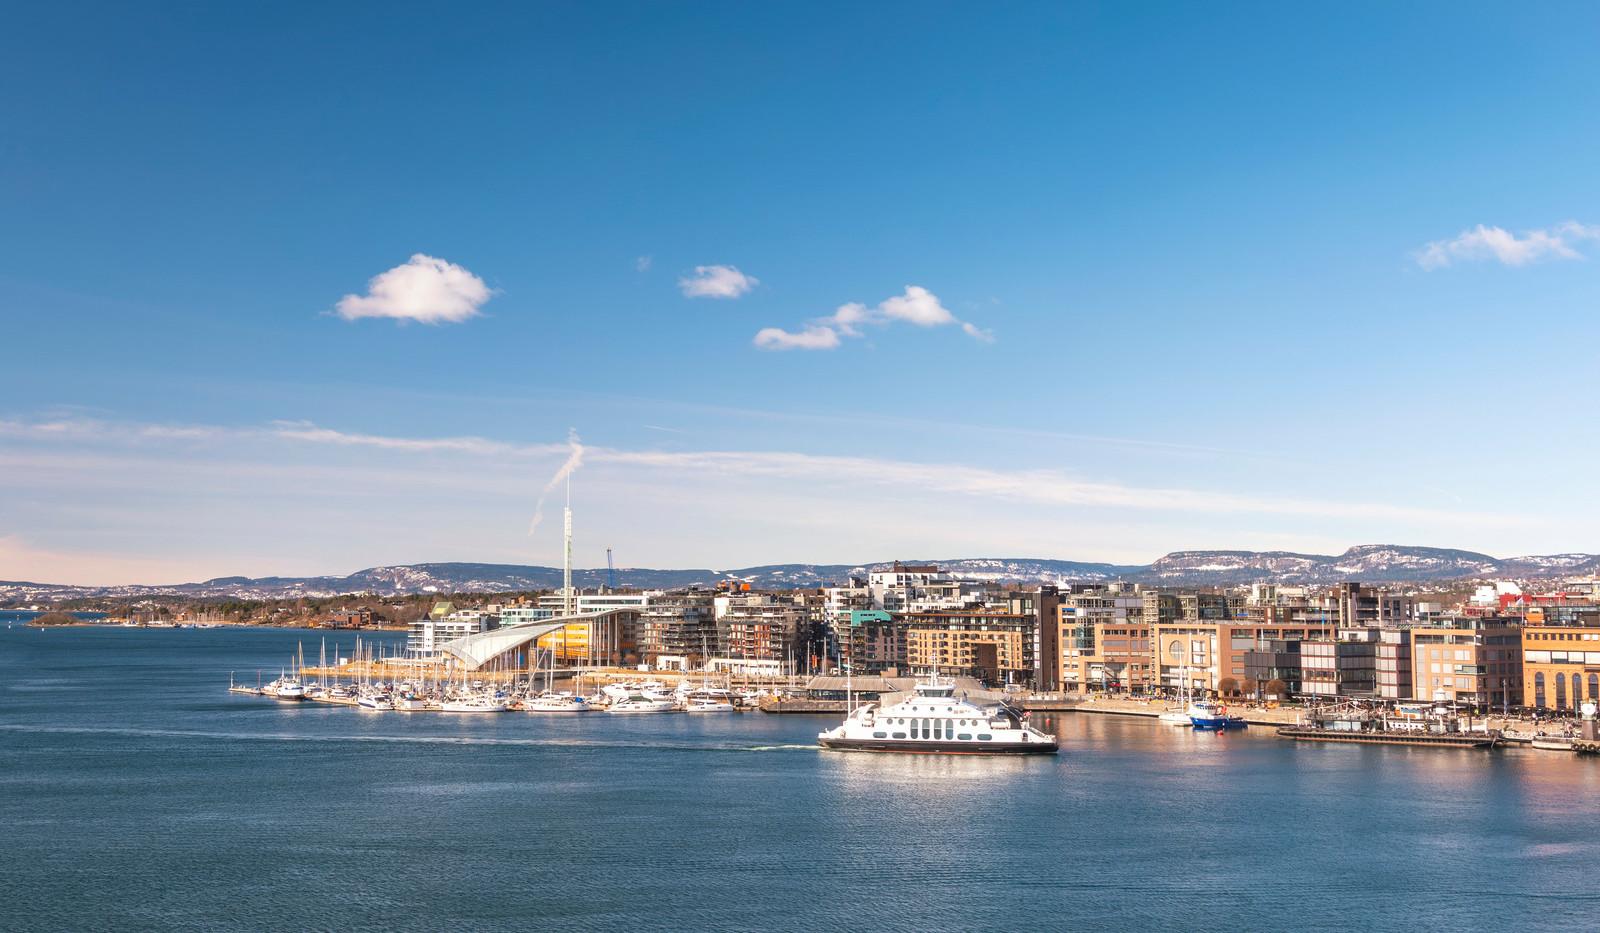 Canva - Oslo city skyline at Oslo Harbou